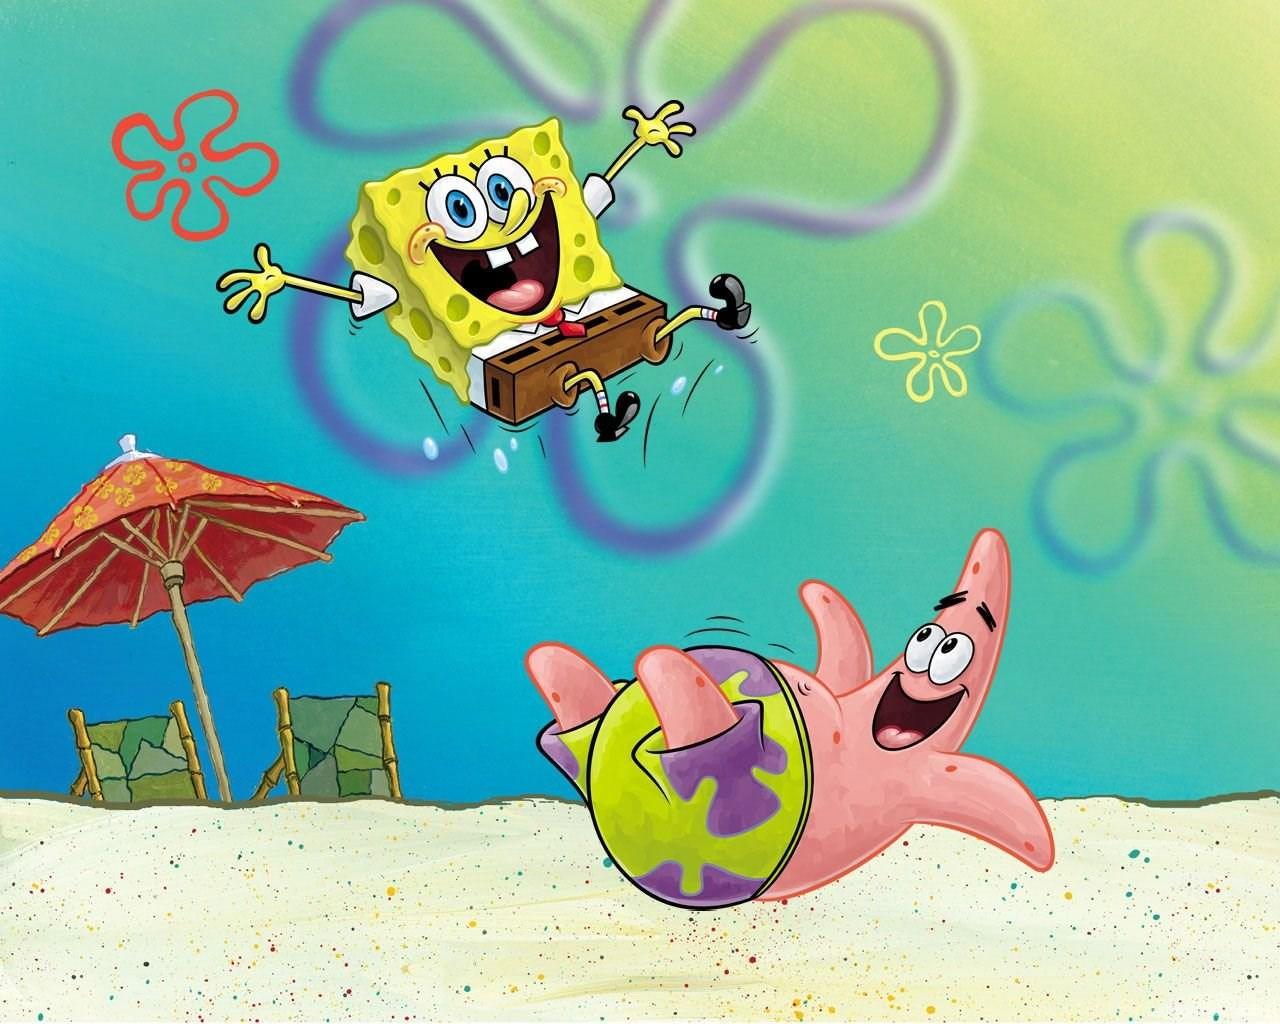 Spongebob Wallpapers Hd: Spongebob & Patrick Spongebob Squarepants Wallpapers